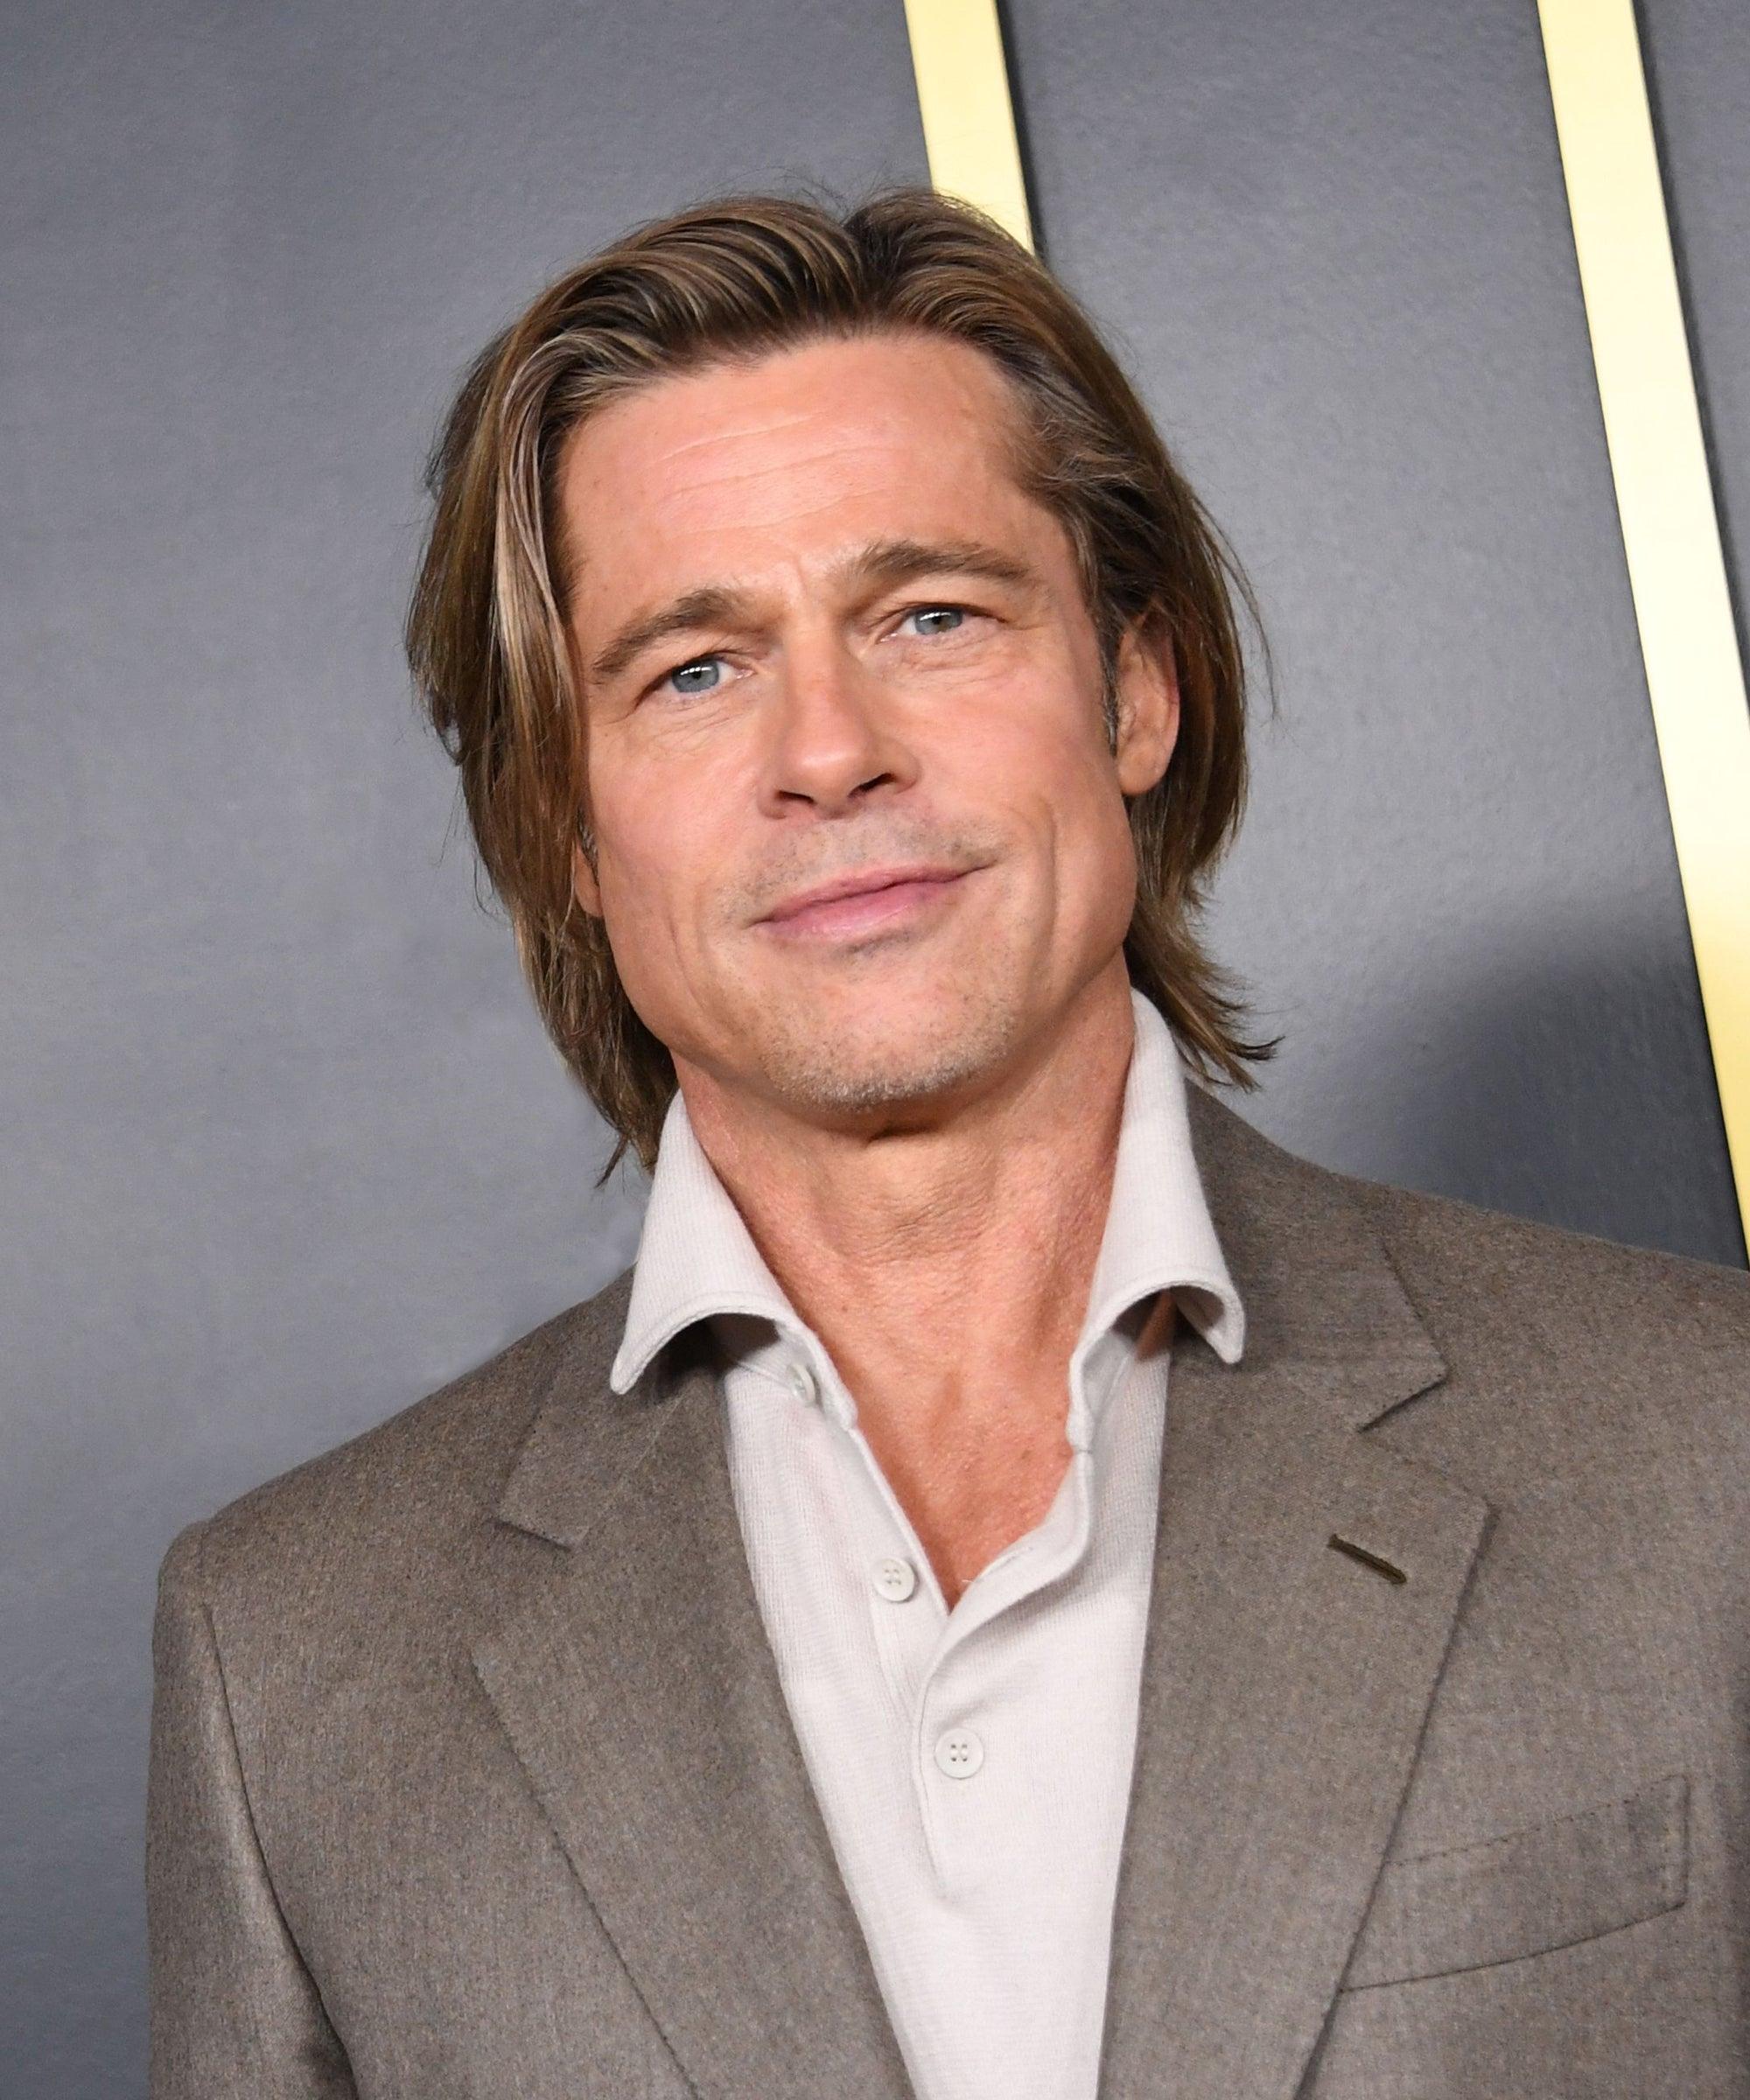 Brad Pitt Nicole Poturalski Dating Rumors Who Is She